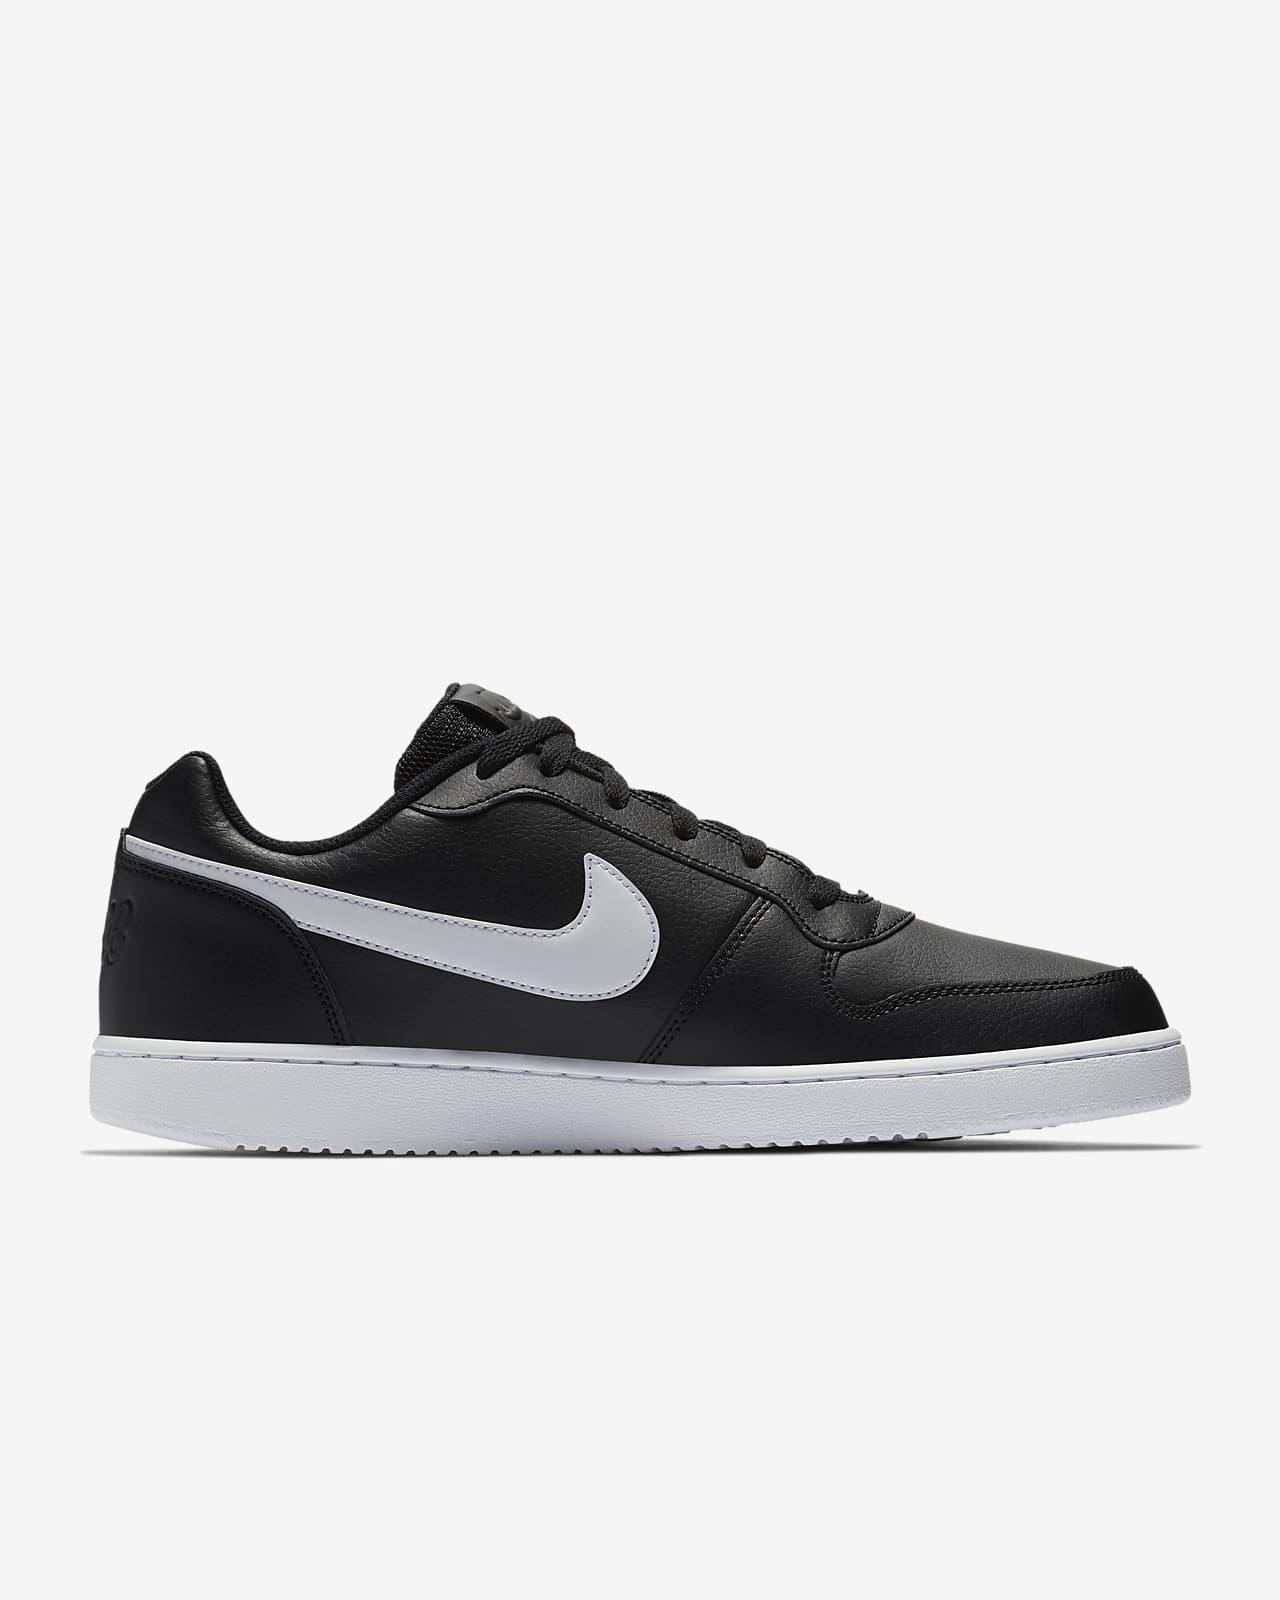 Comparar Sacrificio Pebish  Nike Ebernon Low Men's Shoe. Nike LU